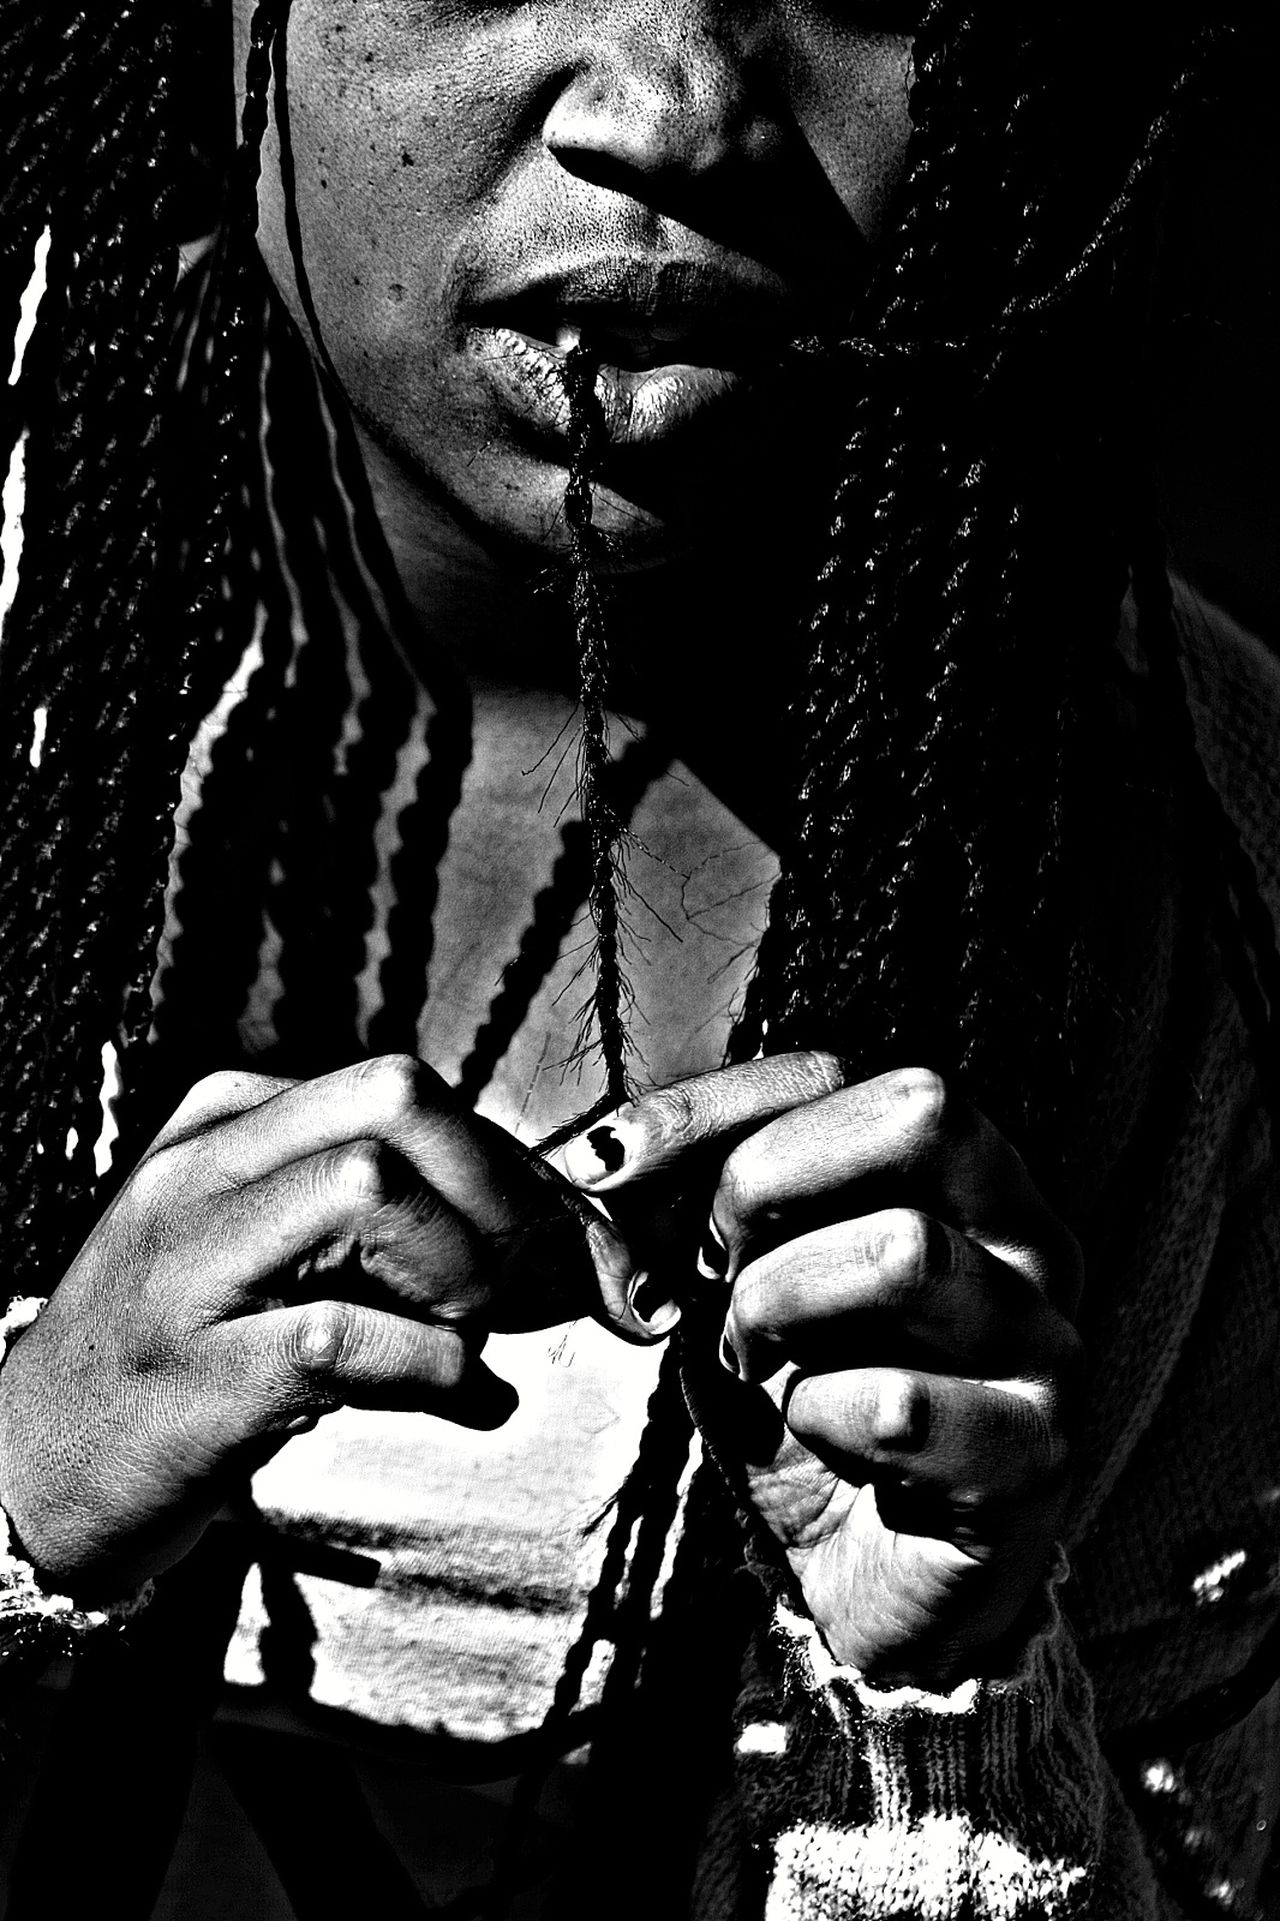 Grooming.....Blackandwhite Photography Johannesburg Childrenofthesun IAmTheGoldRunner The Portraitist - 2016 EyeEm Awards Hair Streetphotography